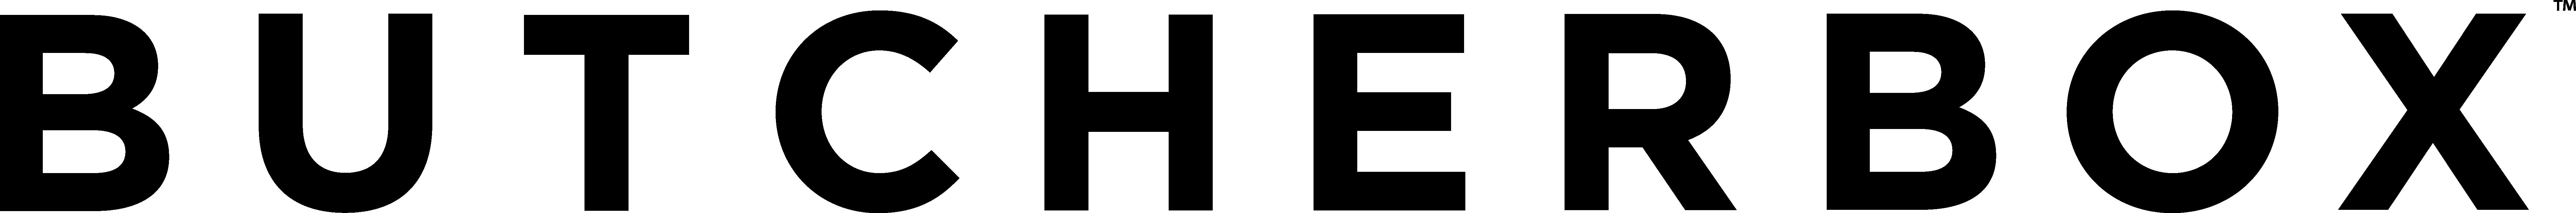 BB_Line_logo_black_tm